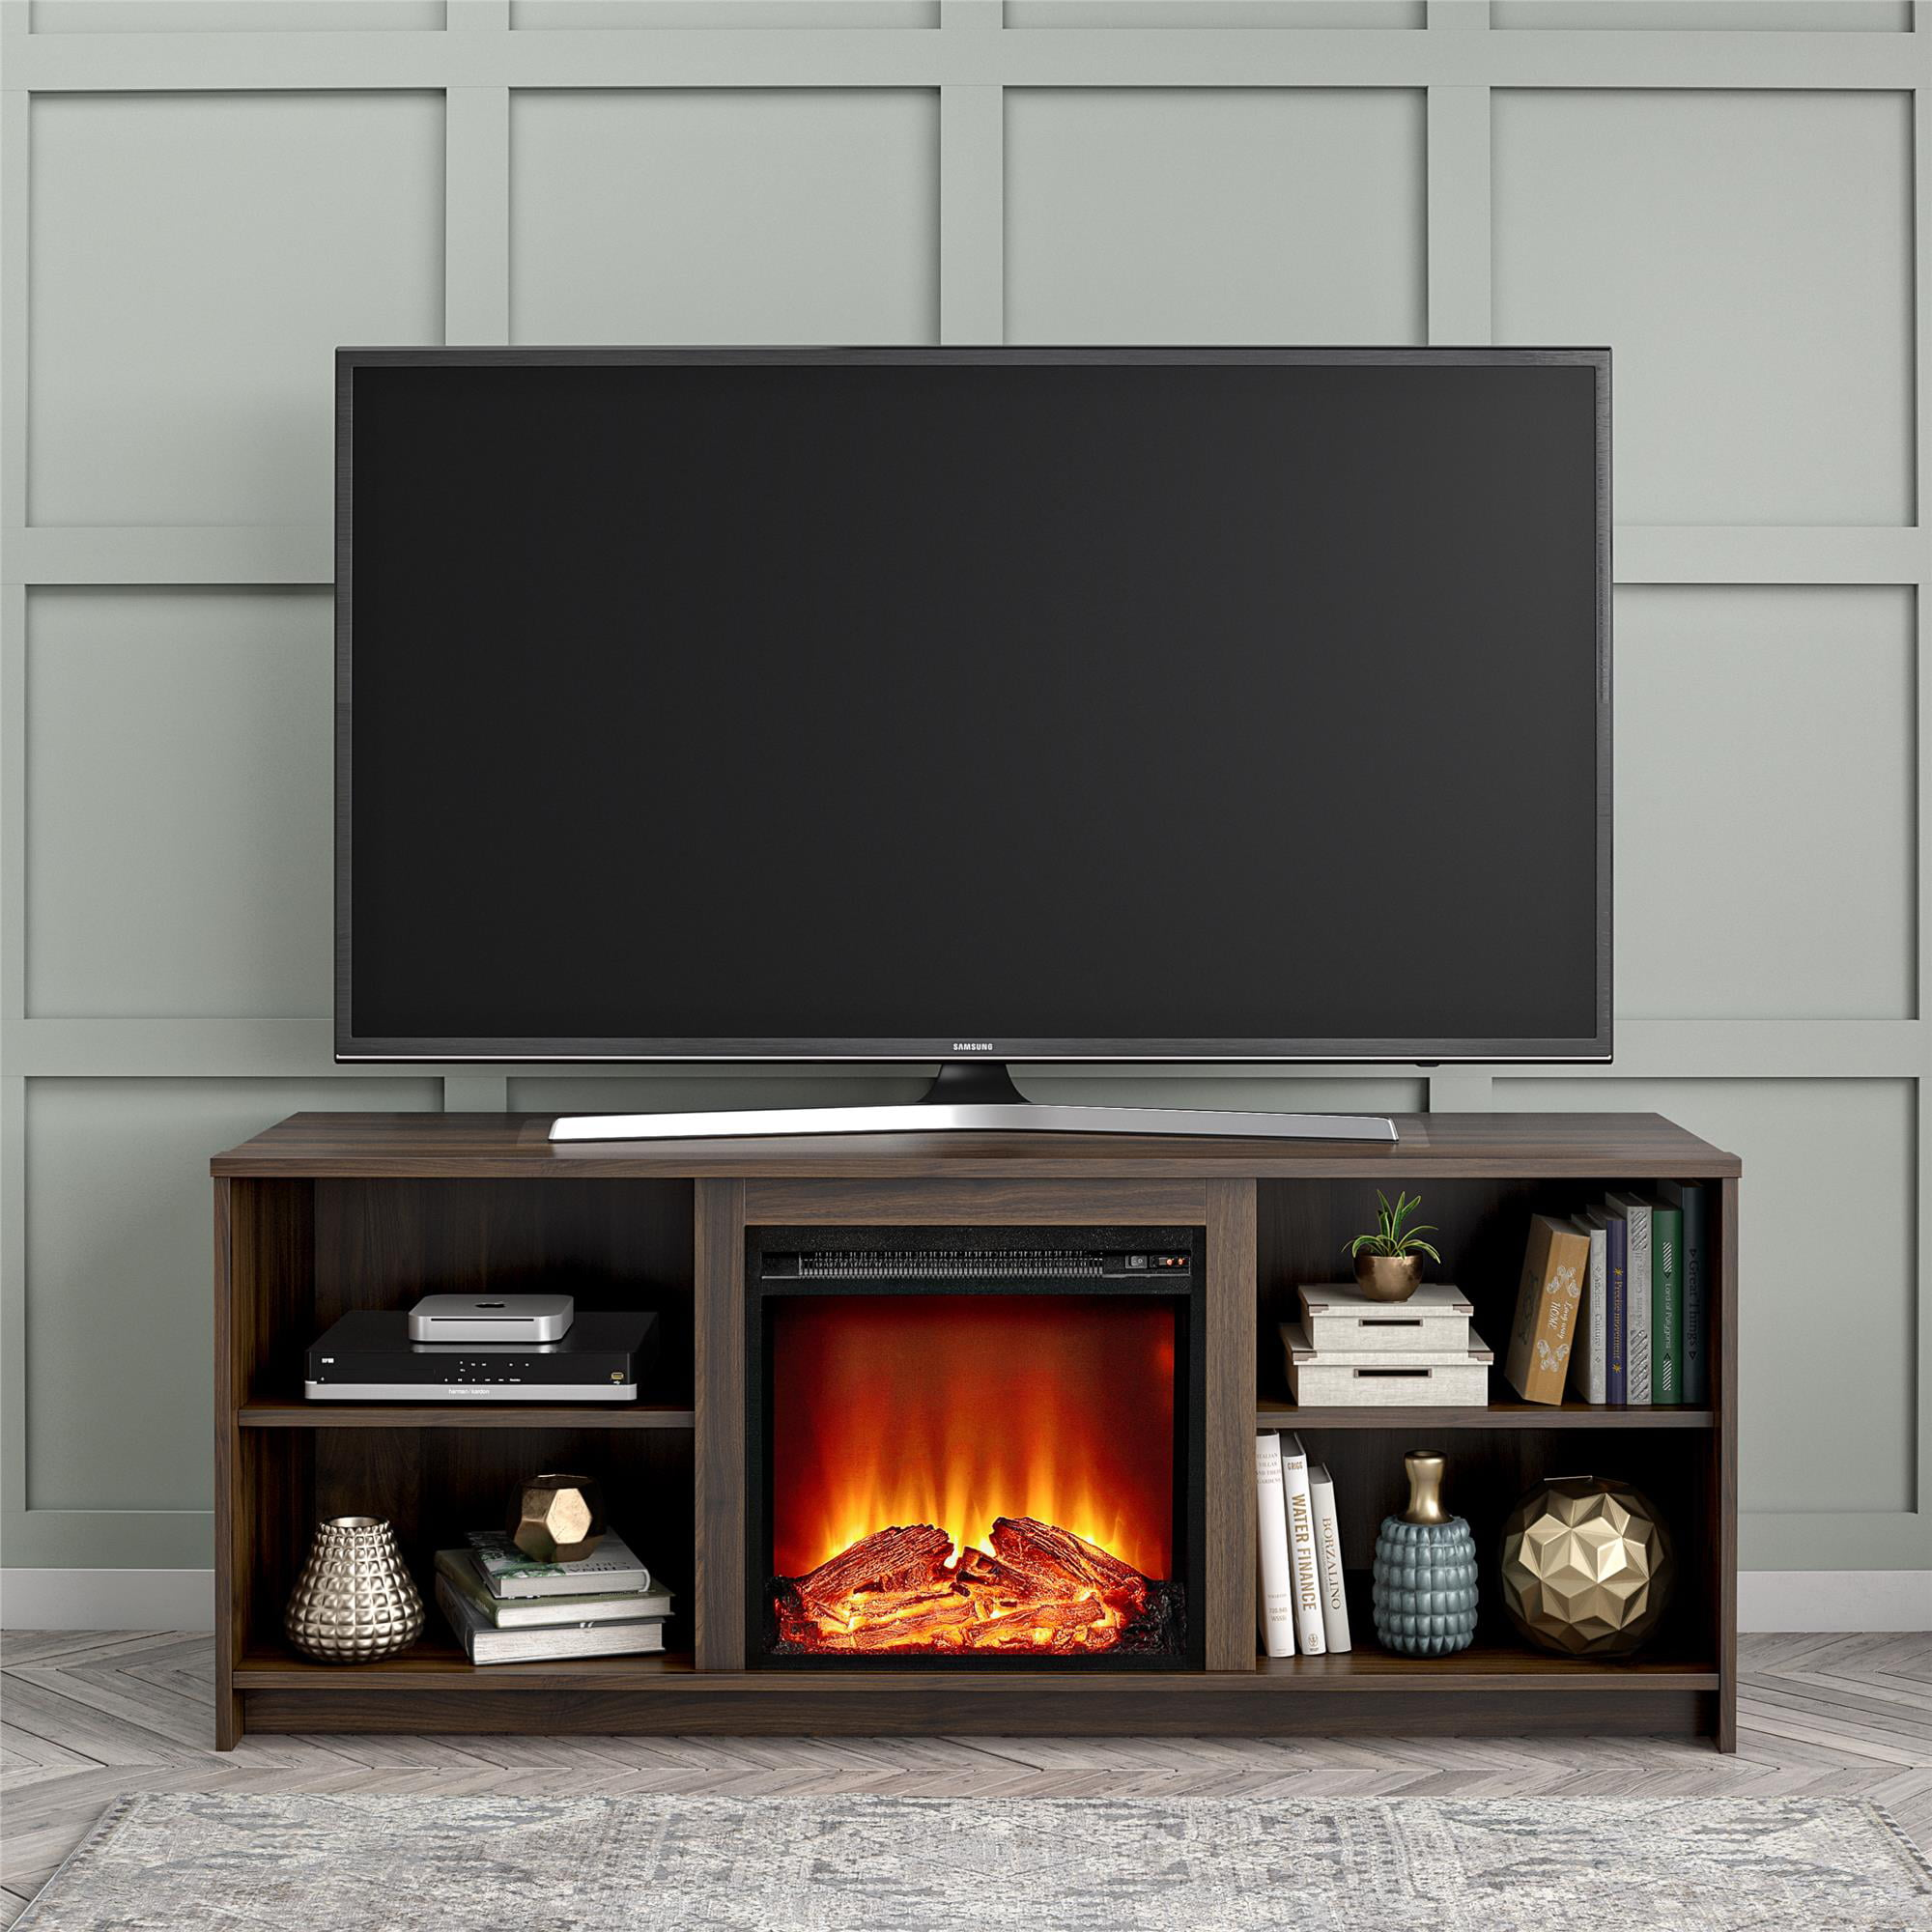 Mainstays Fireplace Tv Stand For Tvs Up To 65 Black Oak Walmart Com Walmart Com